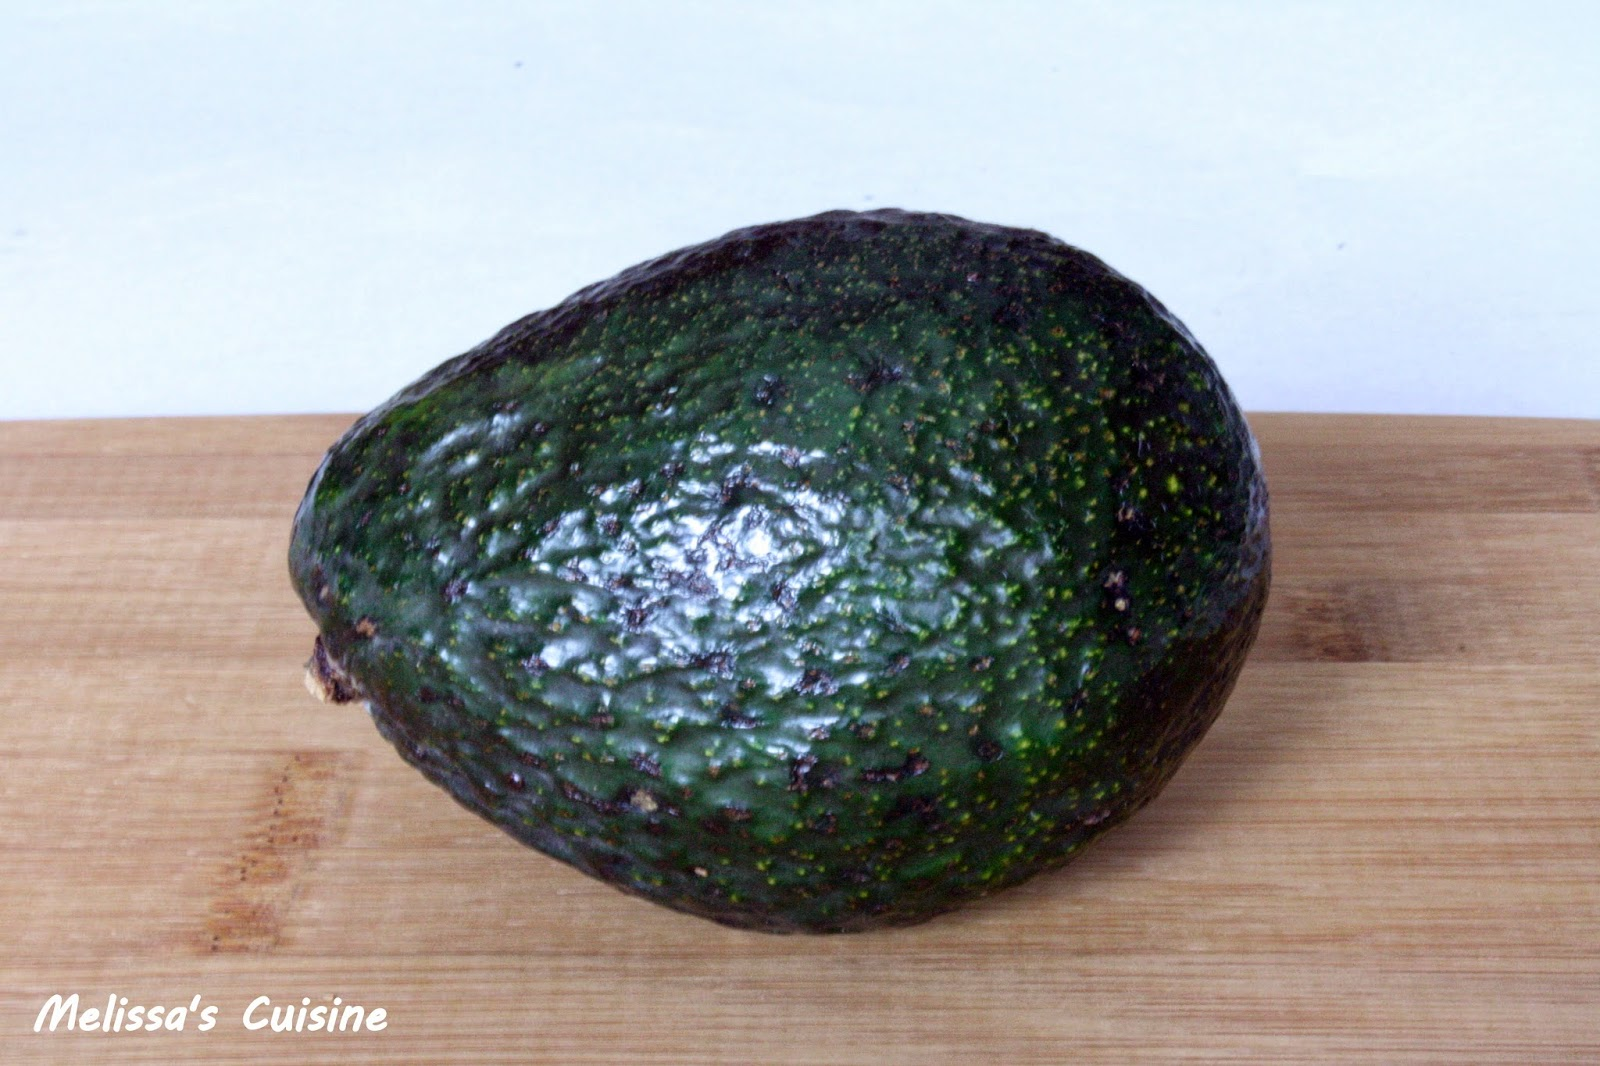 Melissa's Cuisine:  Avocados:  Tips and Tricks